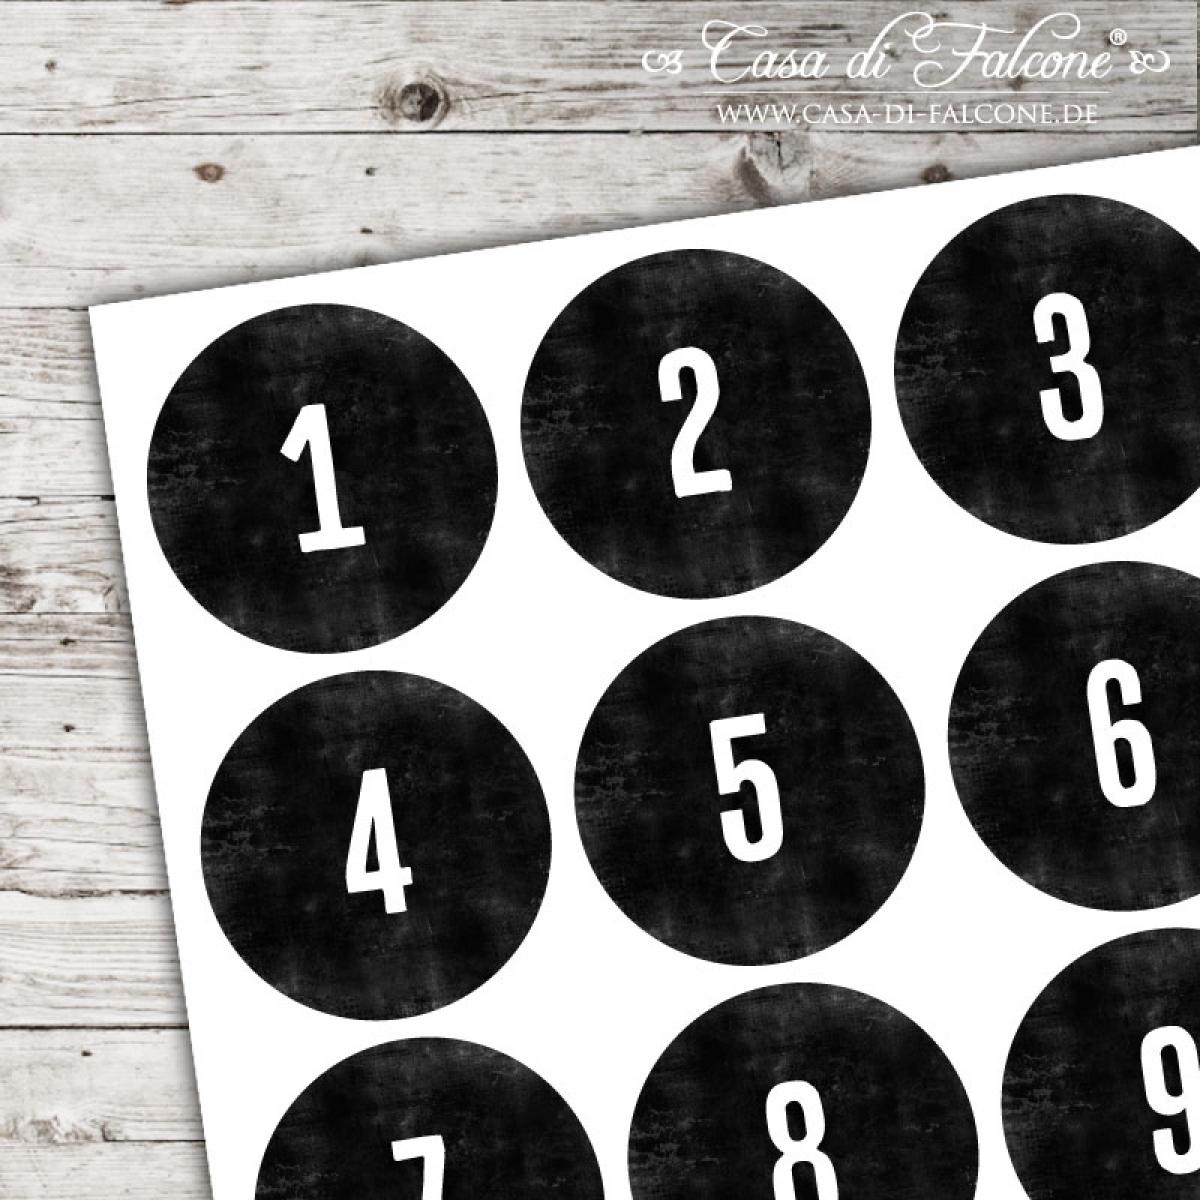 Adventskalender Zahlen Aufkleber Chalkboard Casa Di Falcone